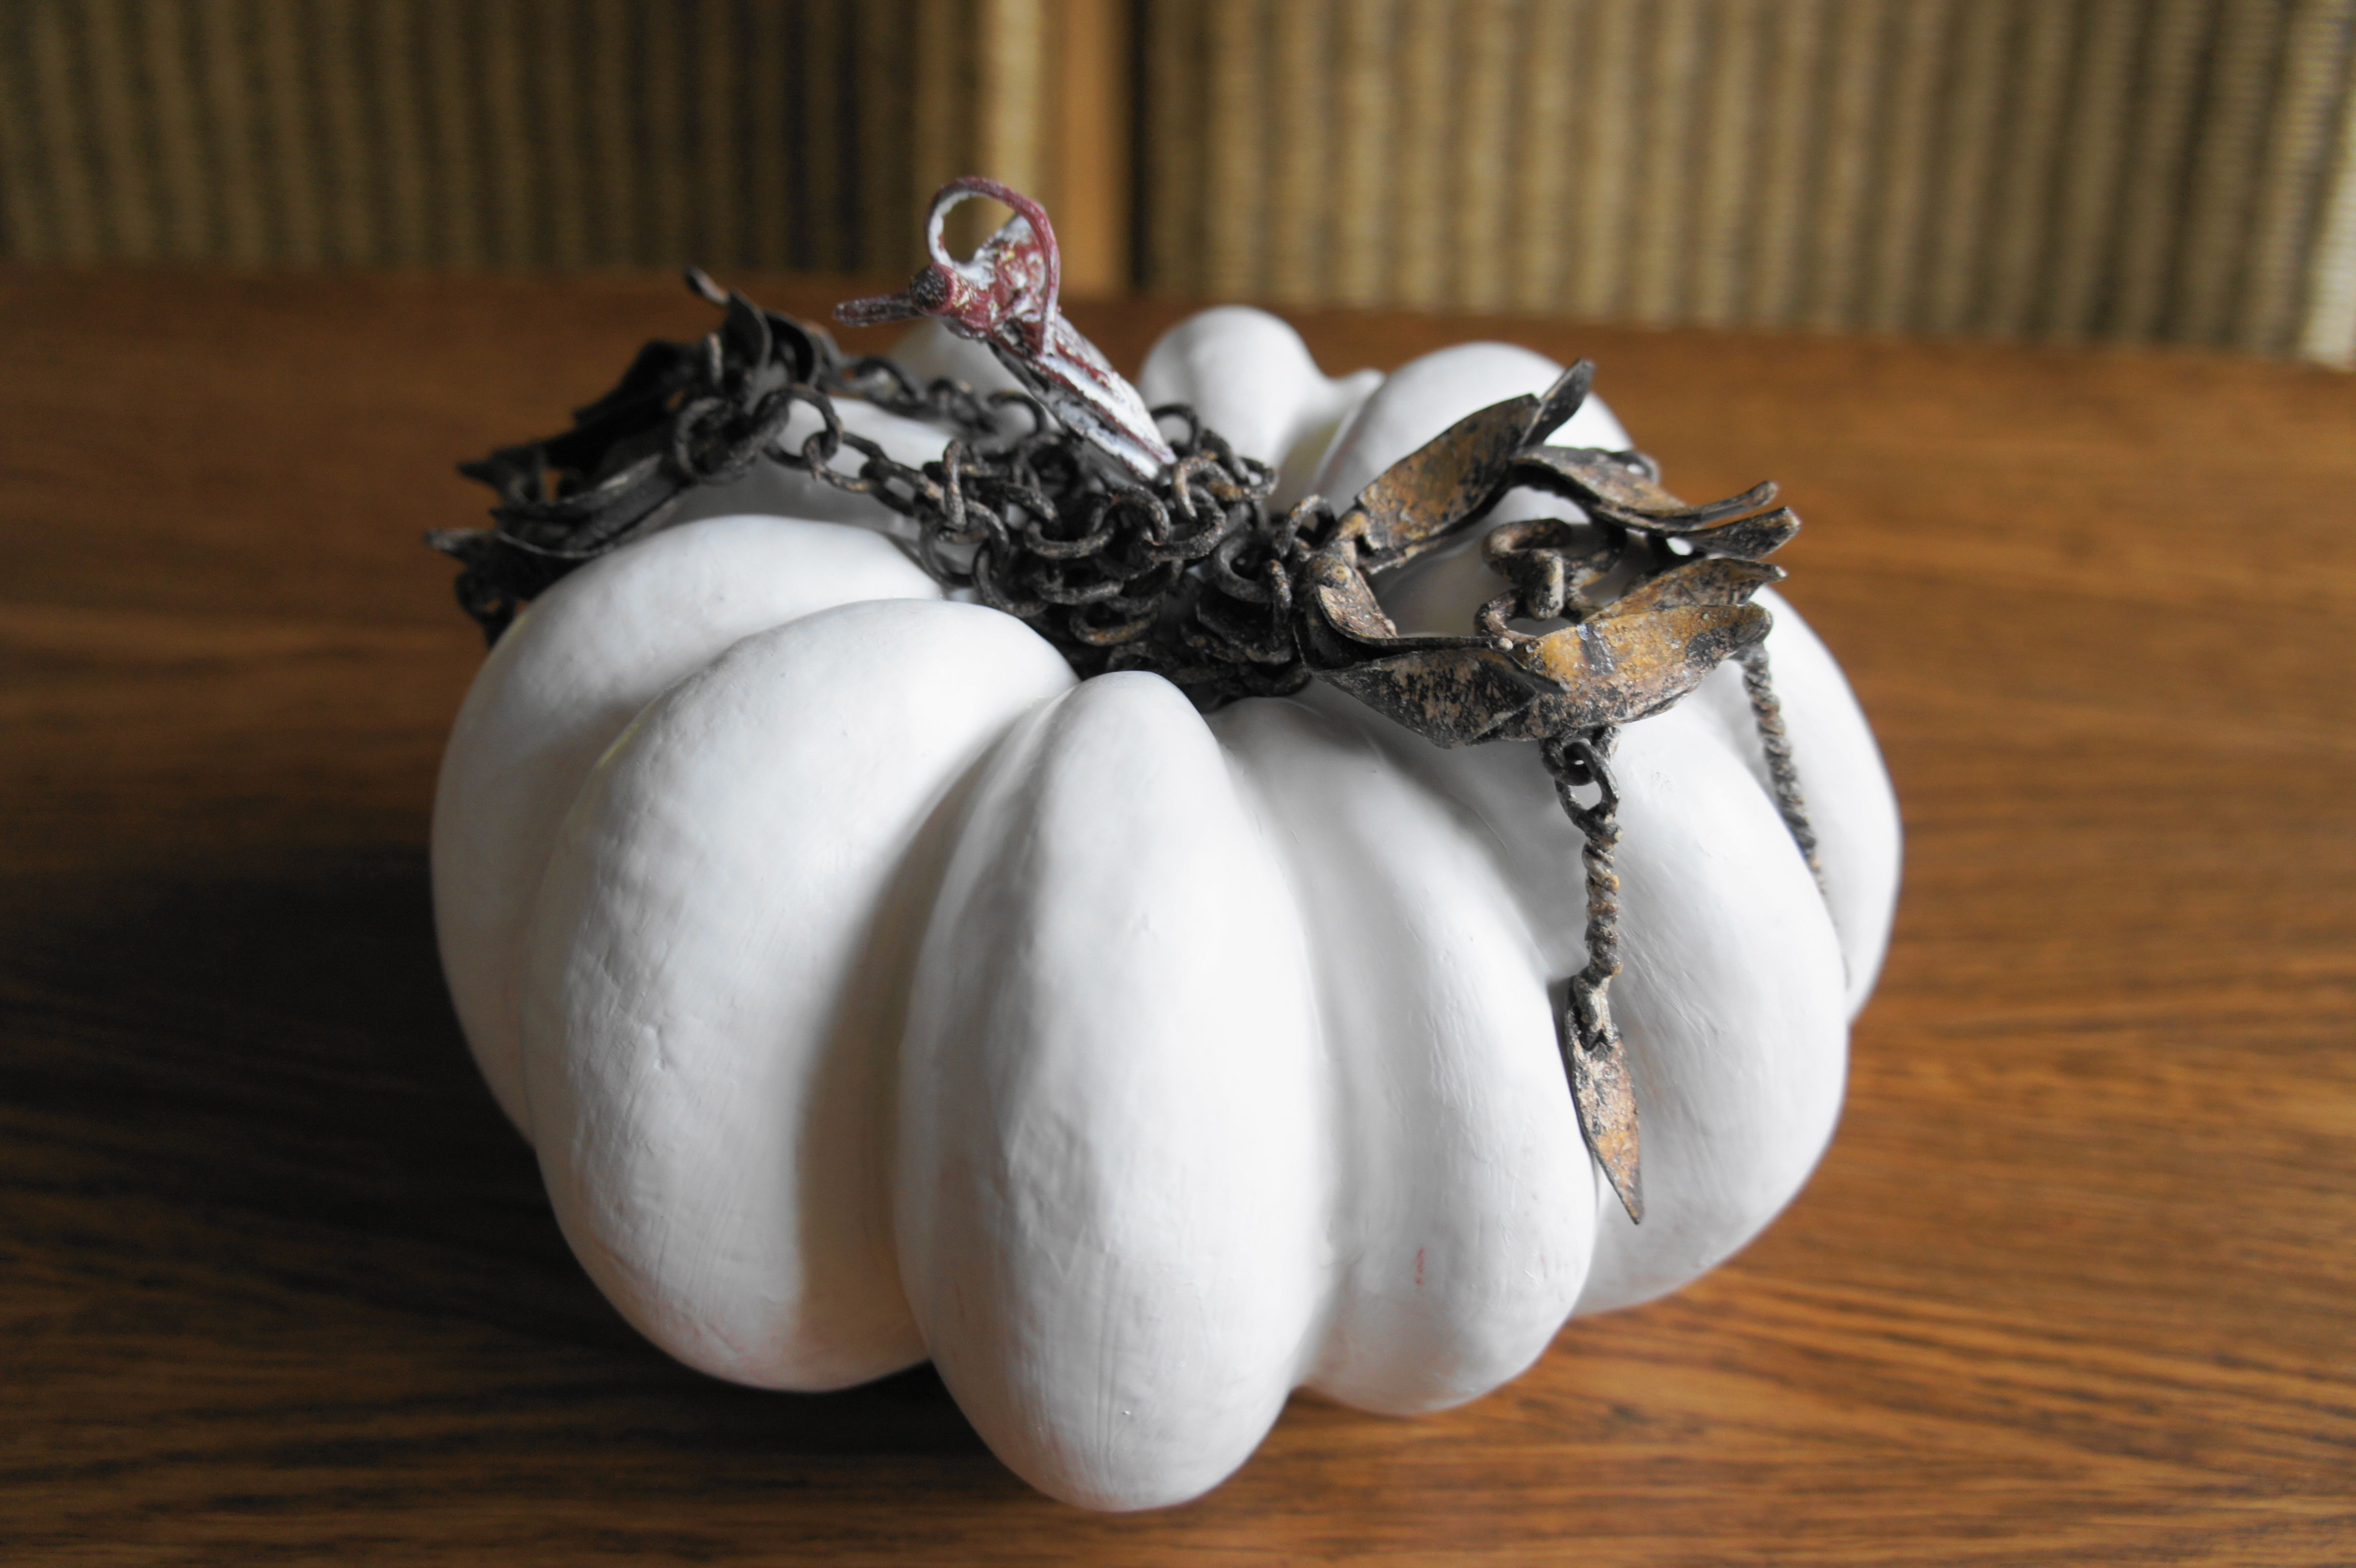 Pumpkin, Plastic pompoen, grondverf, lak (wit, grijs) decoratie.